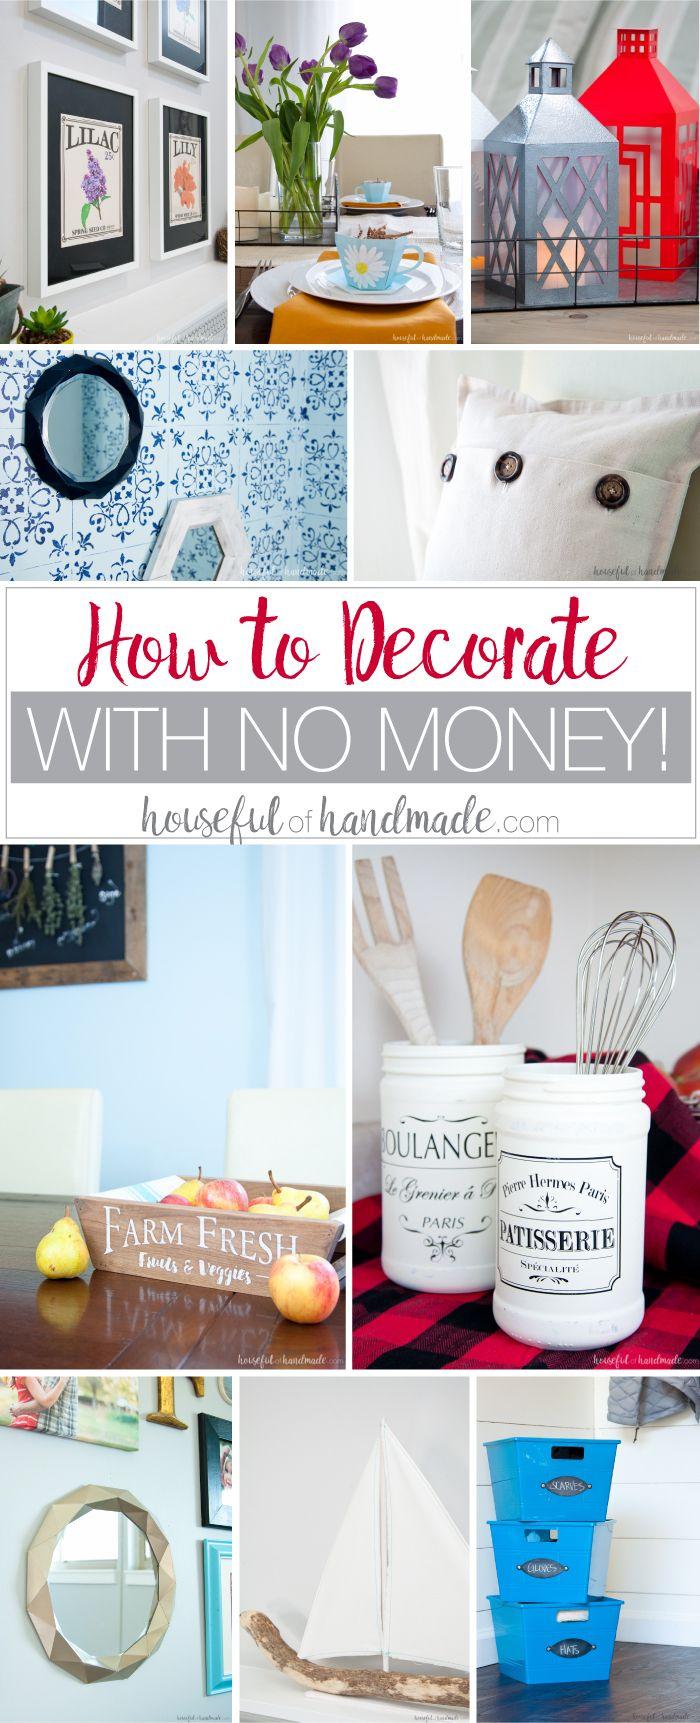 How To Decorate With No Money Home Diy Cheap Home Decor Diy